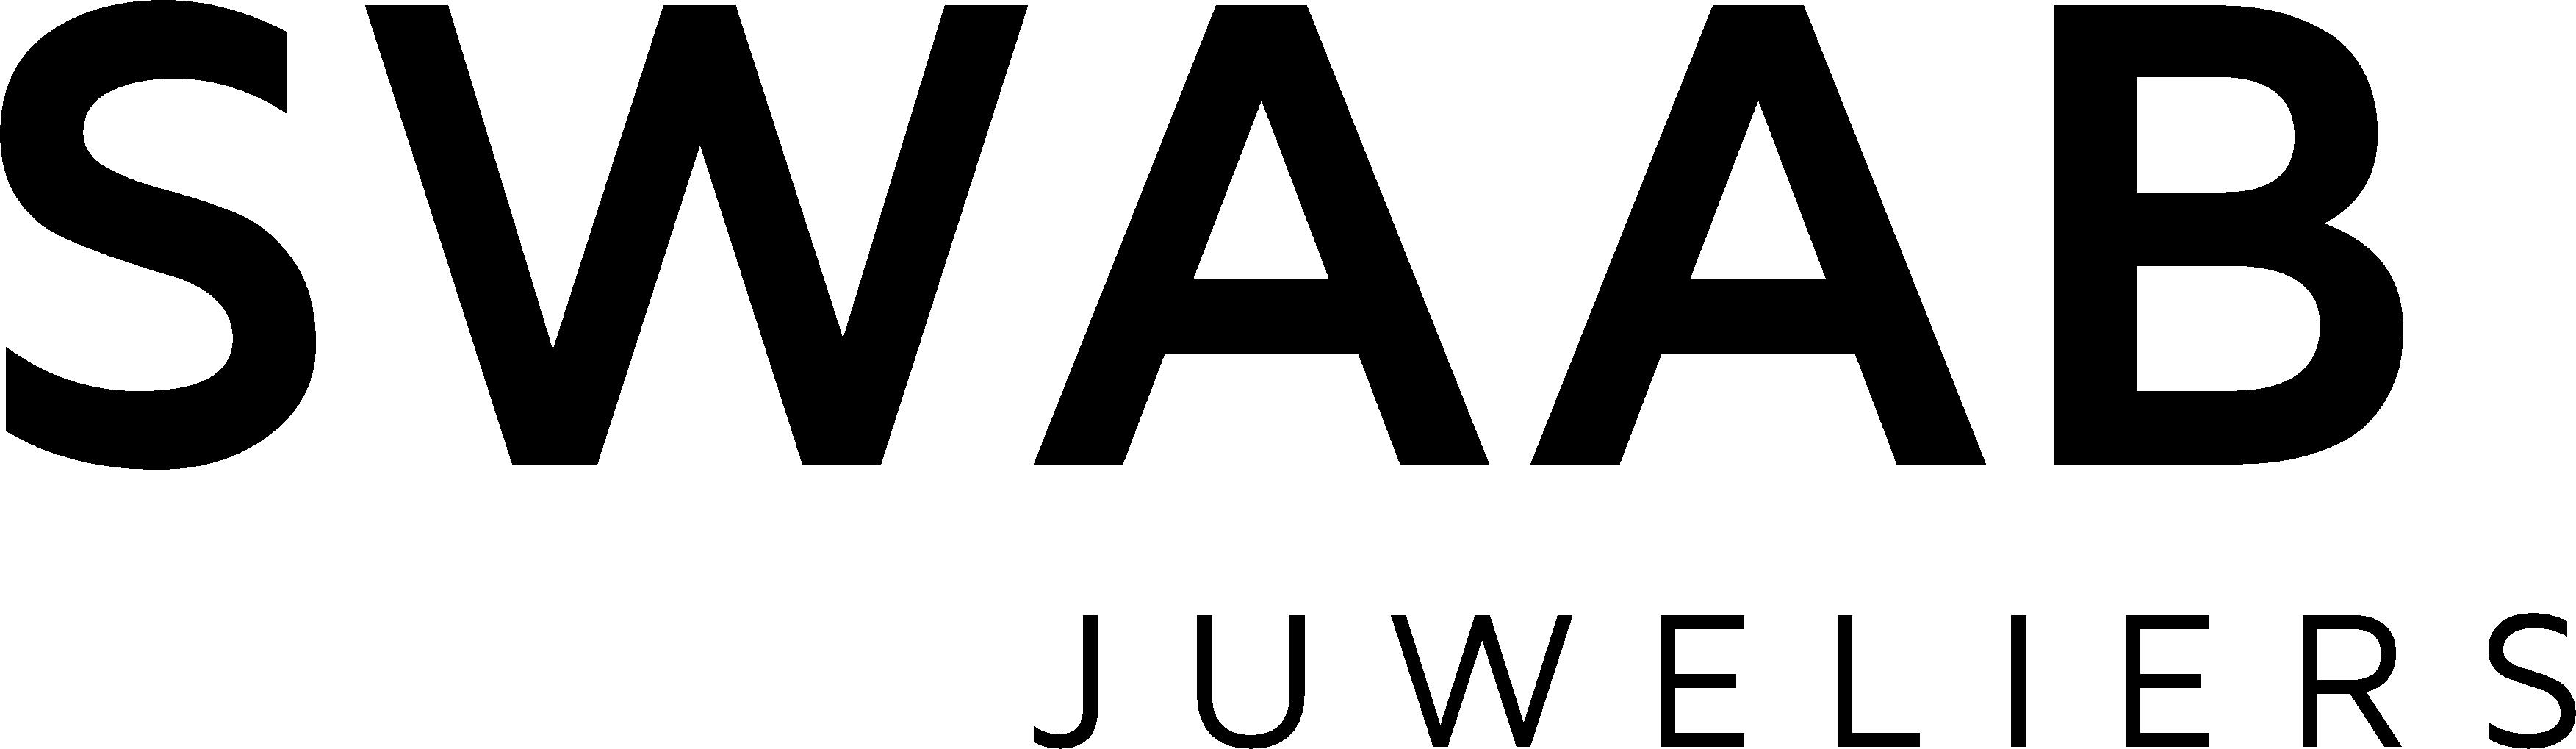 Swaab Juweliers logo